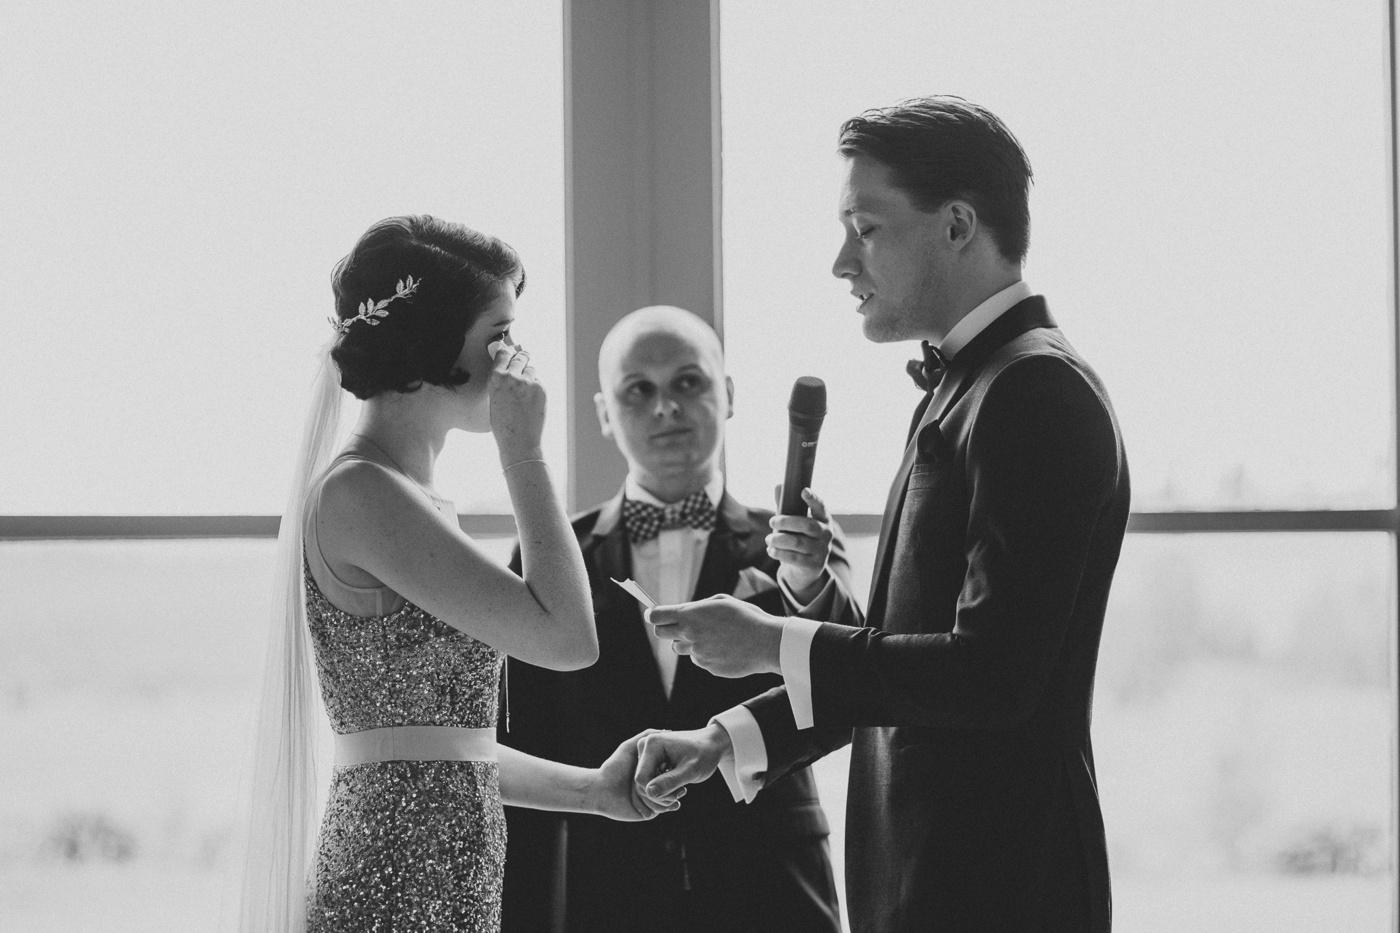 Emma&Morgan_Melbourne-Vintage-Elegant-Fun-Quirky-Yarra-Valley-Vineyard-Wedding_Melbourne-Wedding-Photography-49